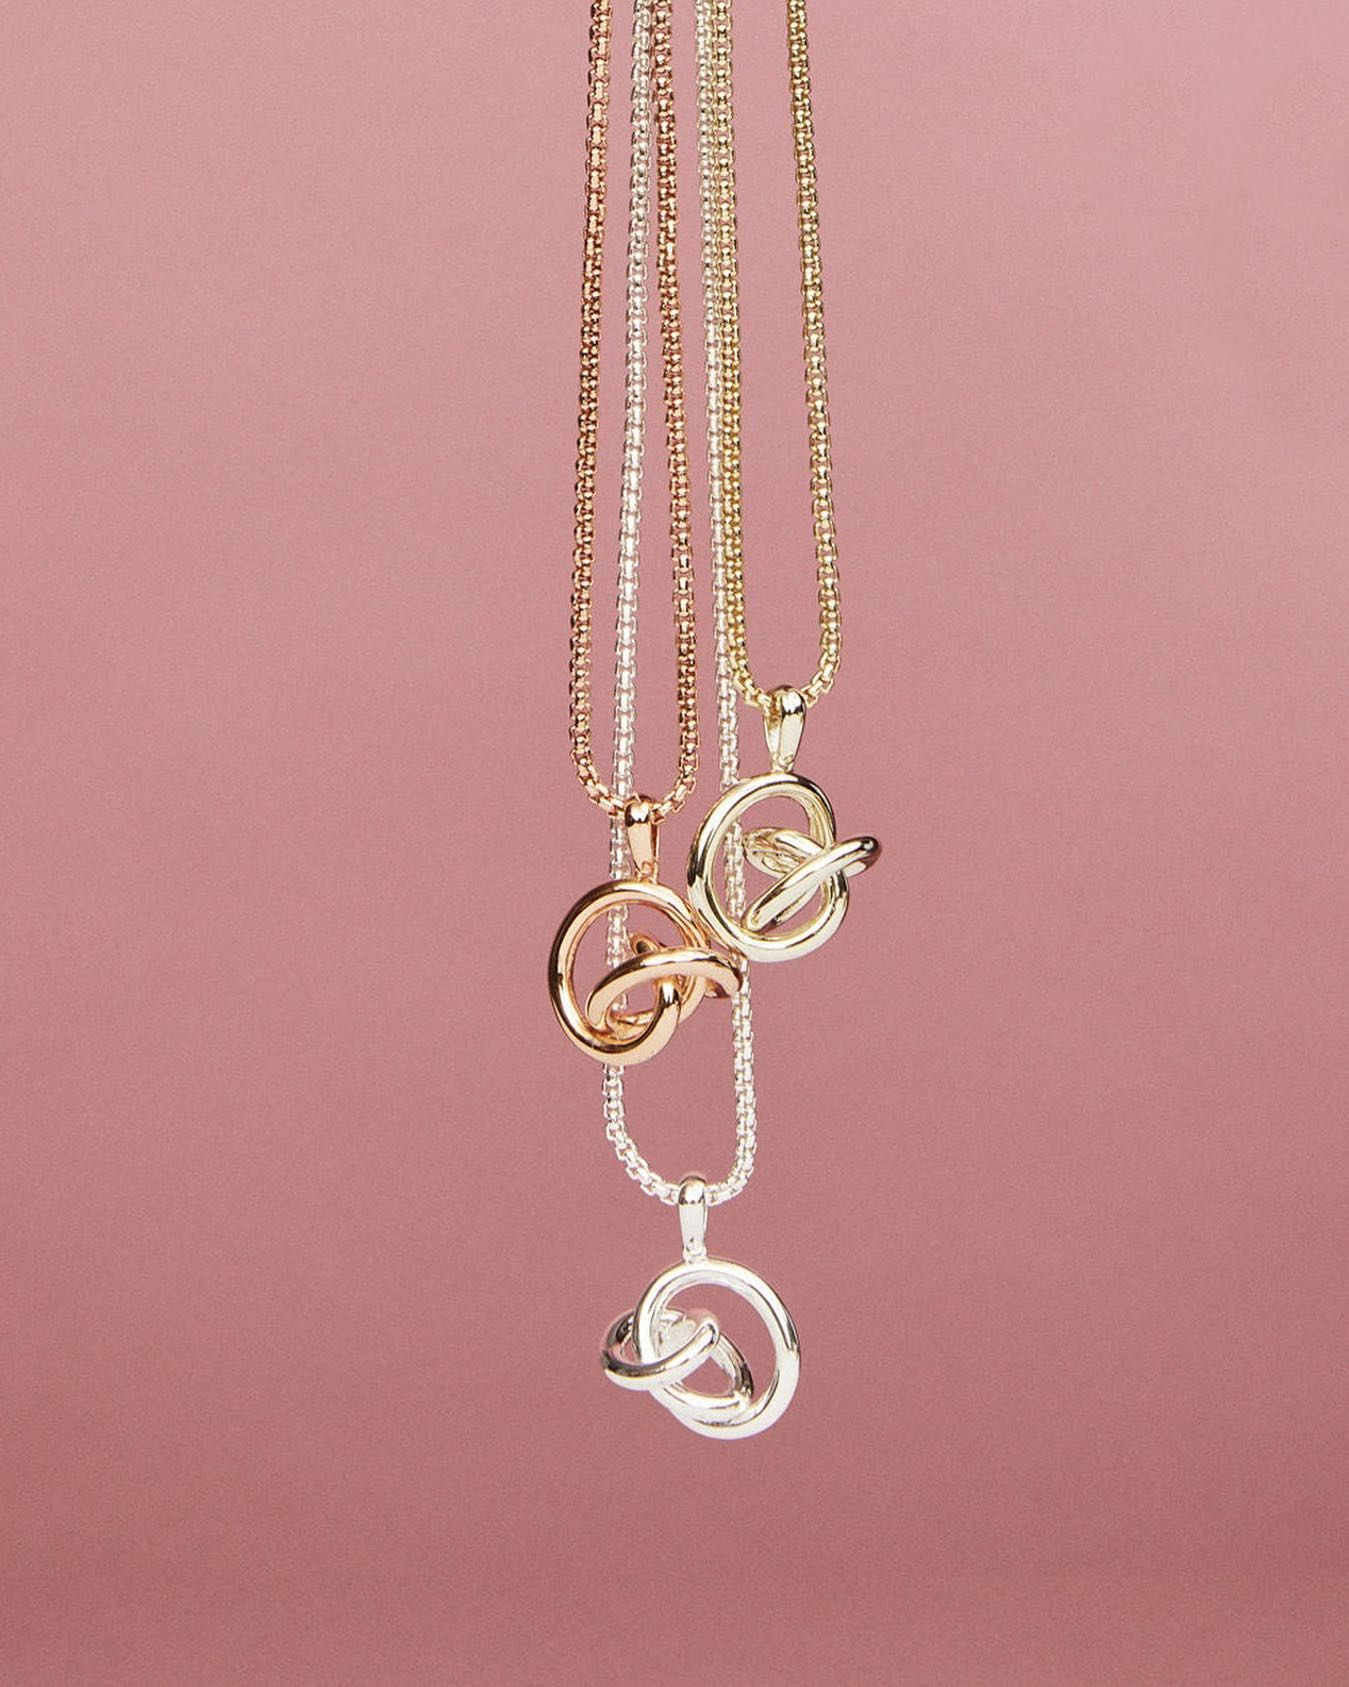 Love tie necklace-Goldfiled necklace-Natural Stone necklace-love charm stylish necklace-dainty,delicate,sexy necklace-boho style choker